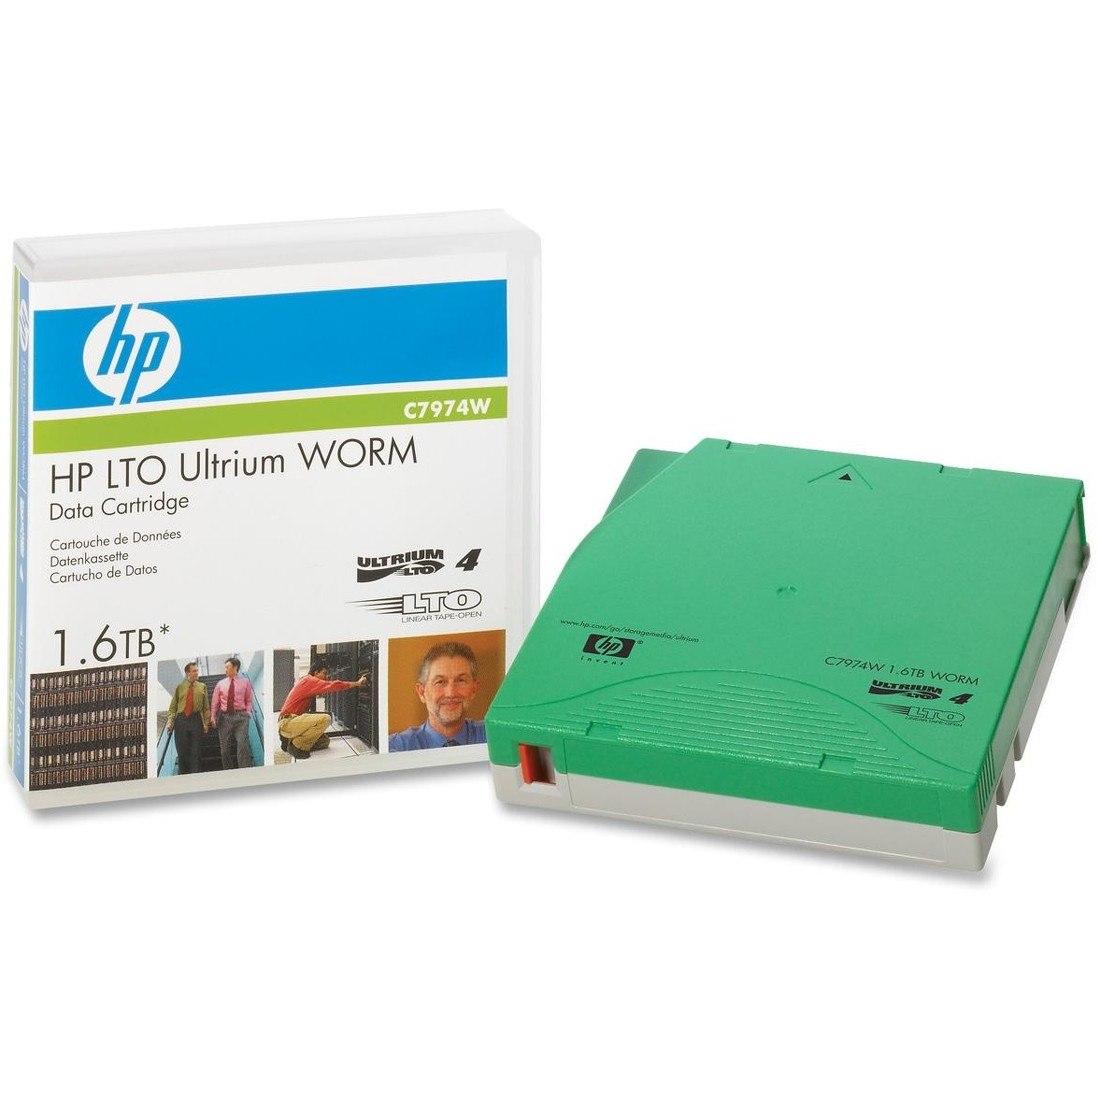 HPE Data Cartridge LTO-4 - WORM